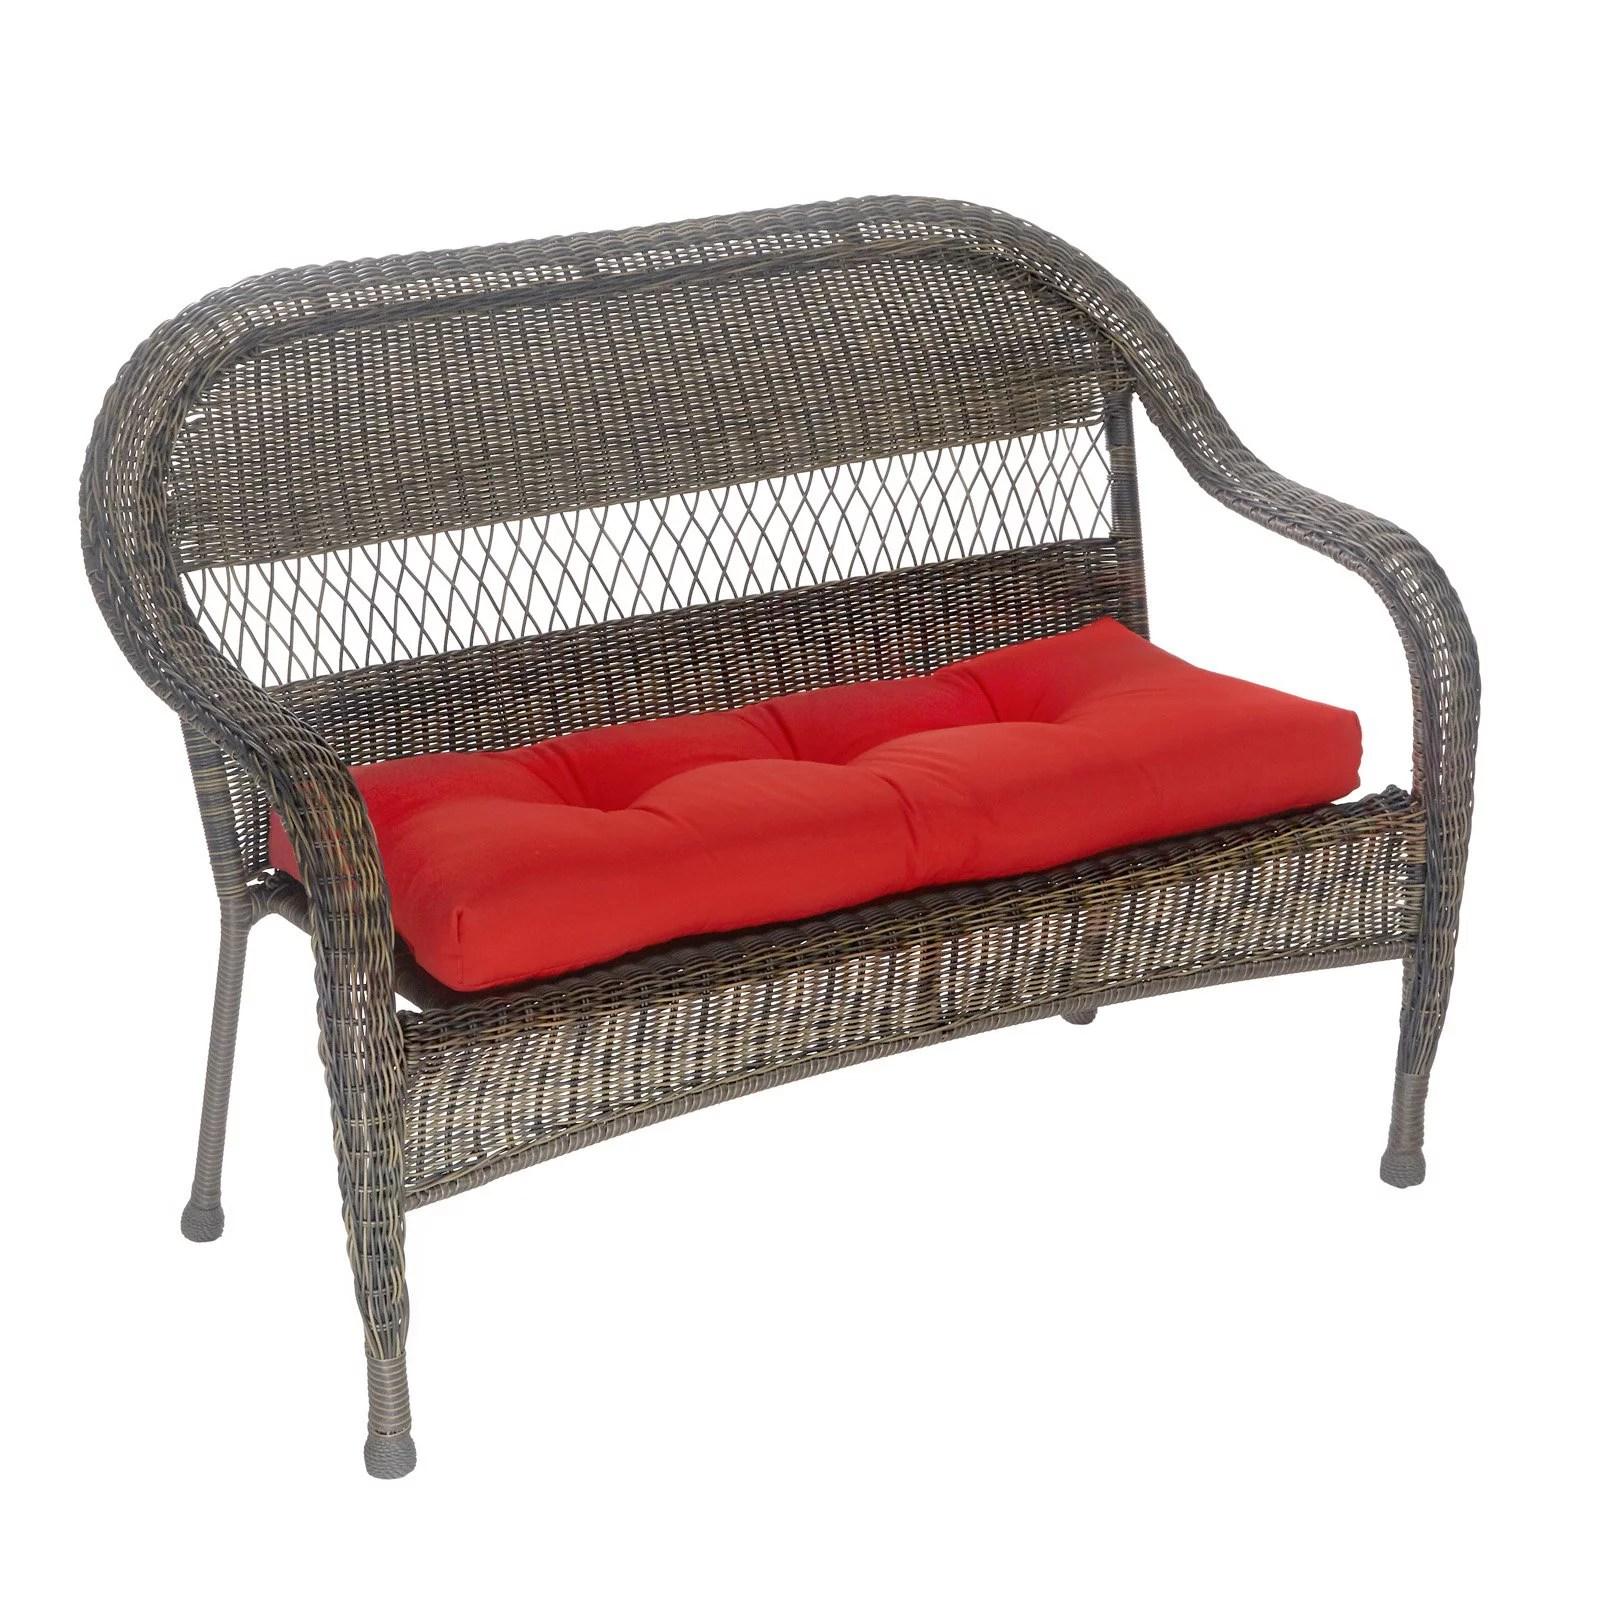 patio outdoor indoor red bench cushion 43 x 19 x 3